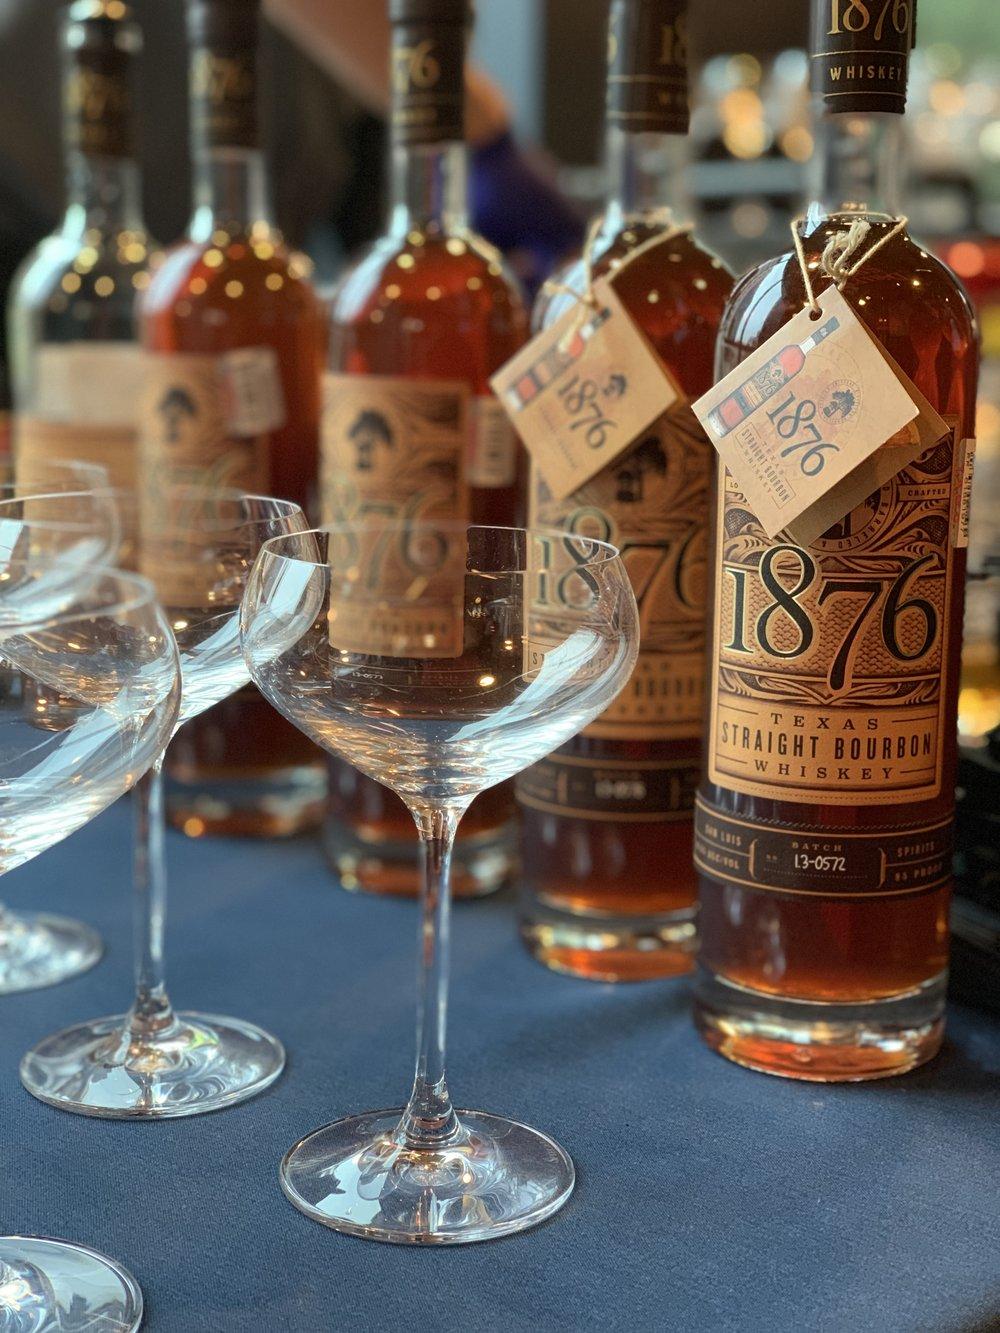 1876 Straight Bourbon Whiskey